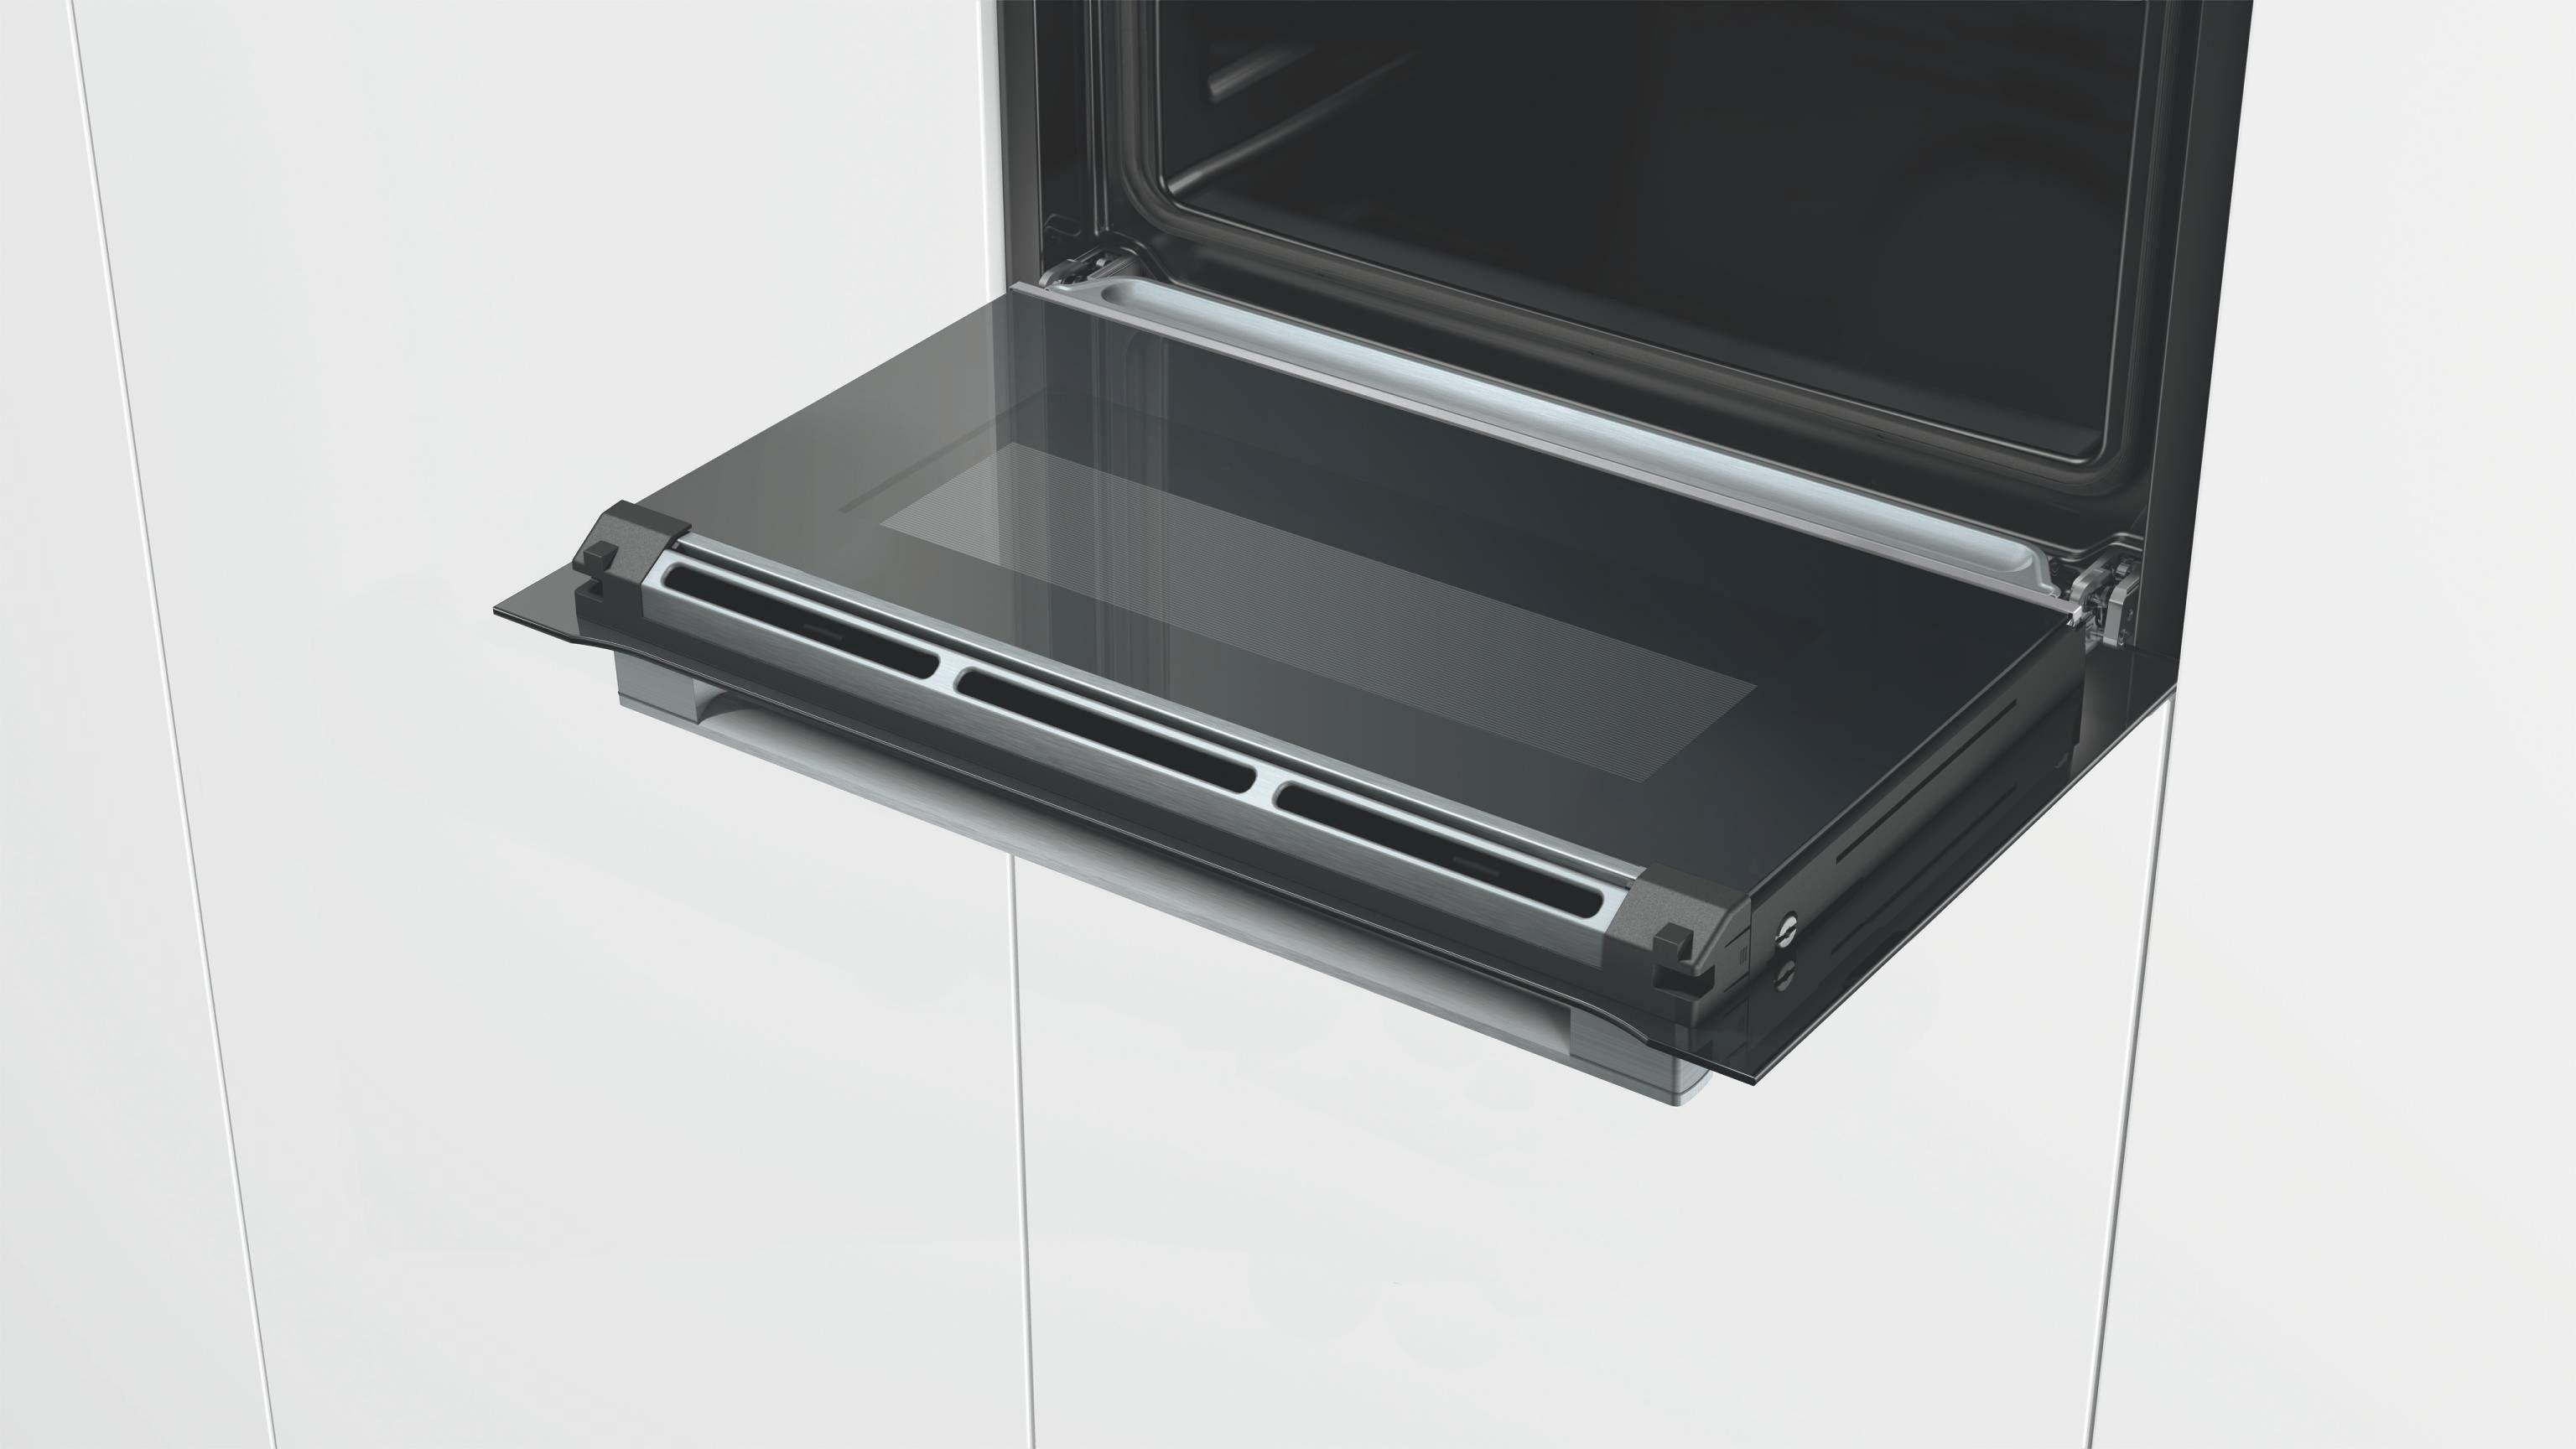 Kompaktbackofen Bosch Csg656rb6, EEZ A+ - Glas (59,5/45,5/54,8cm) - BOSCH